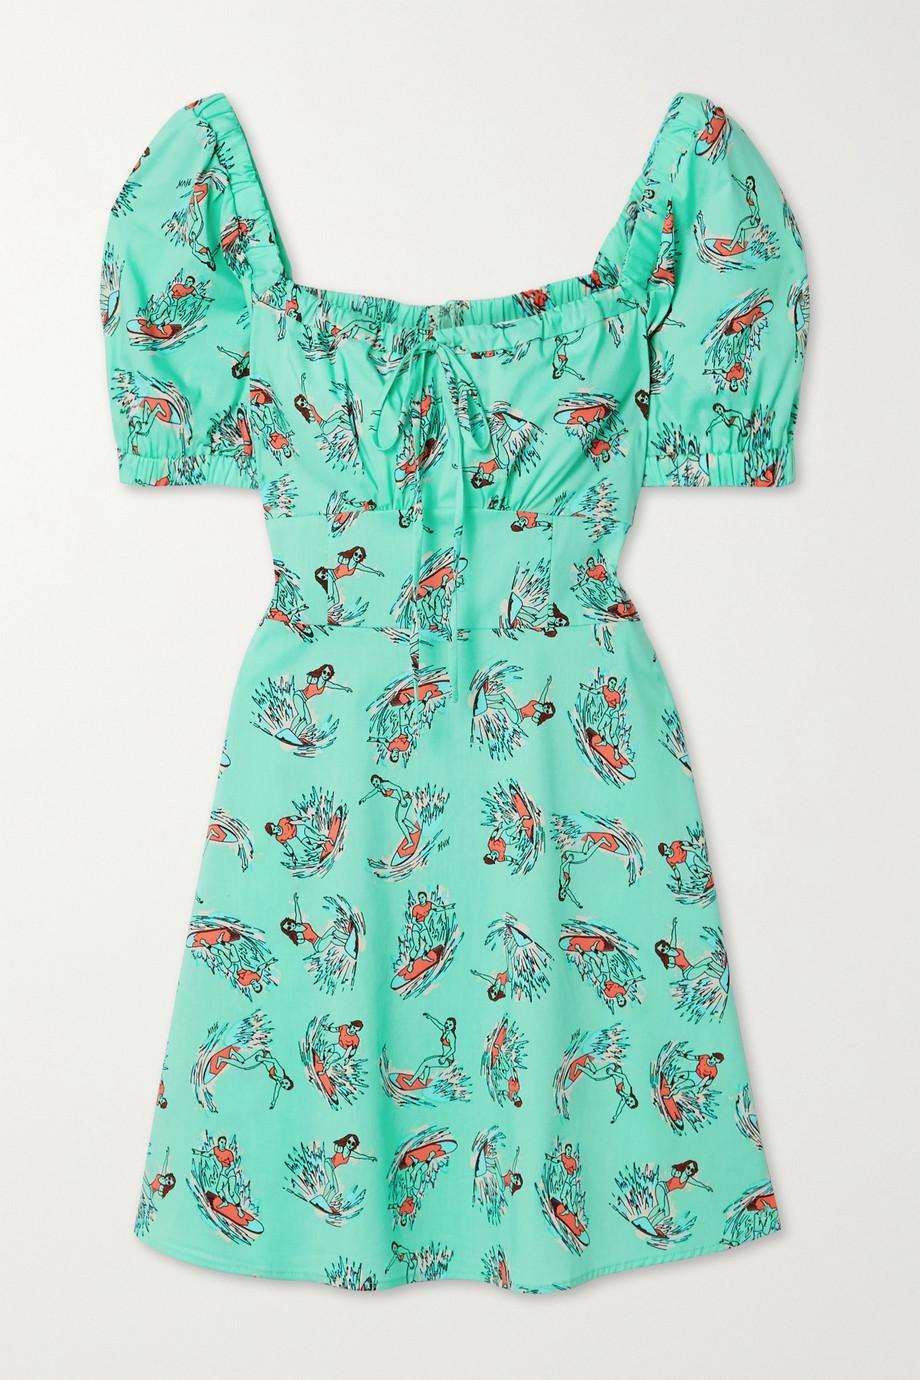 HVN Holland printed cotton-blend poplin mini dress